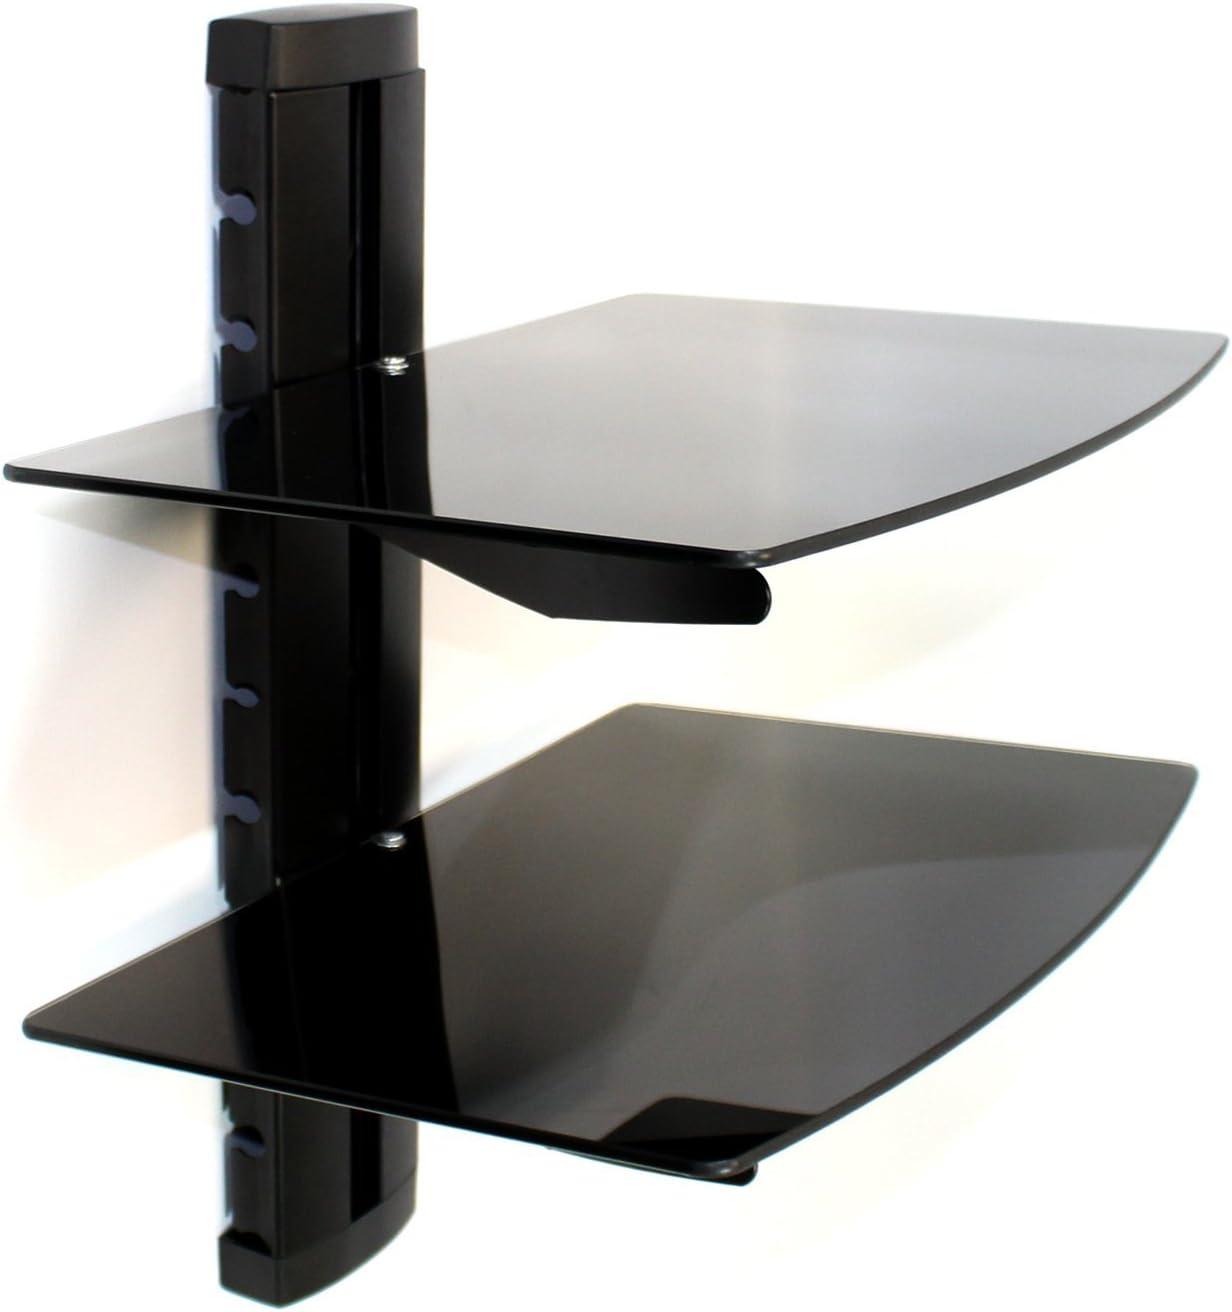 Maison & White Consolas flotantes de vidrio negro templado Consolas de montaje en pared / Reproductores de DVD 2 Tier